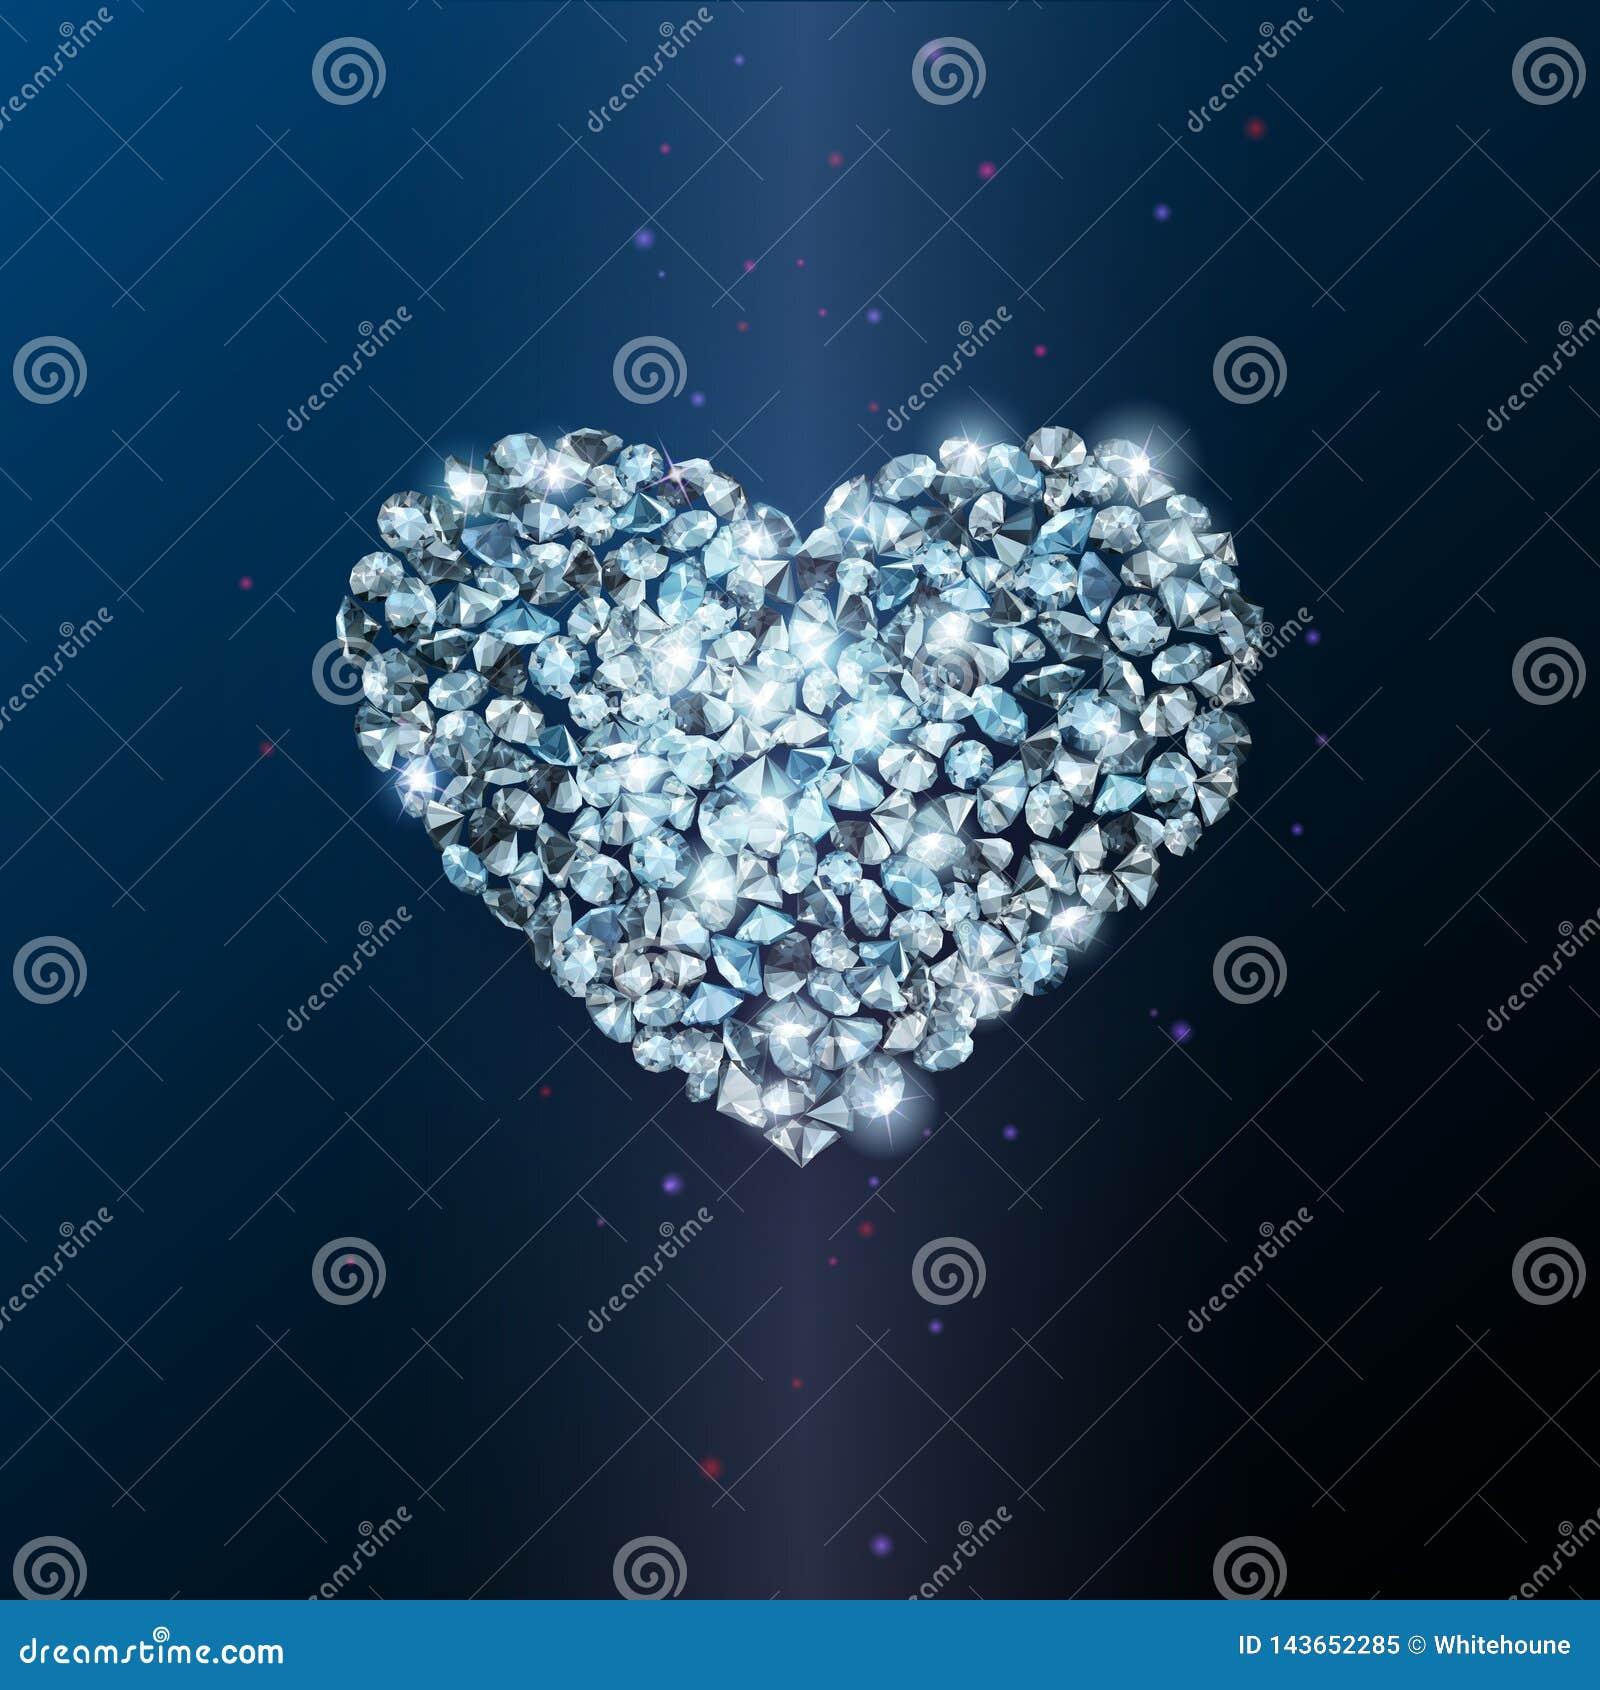 Heart sign made of shiny sparkling diamonds